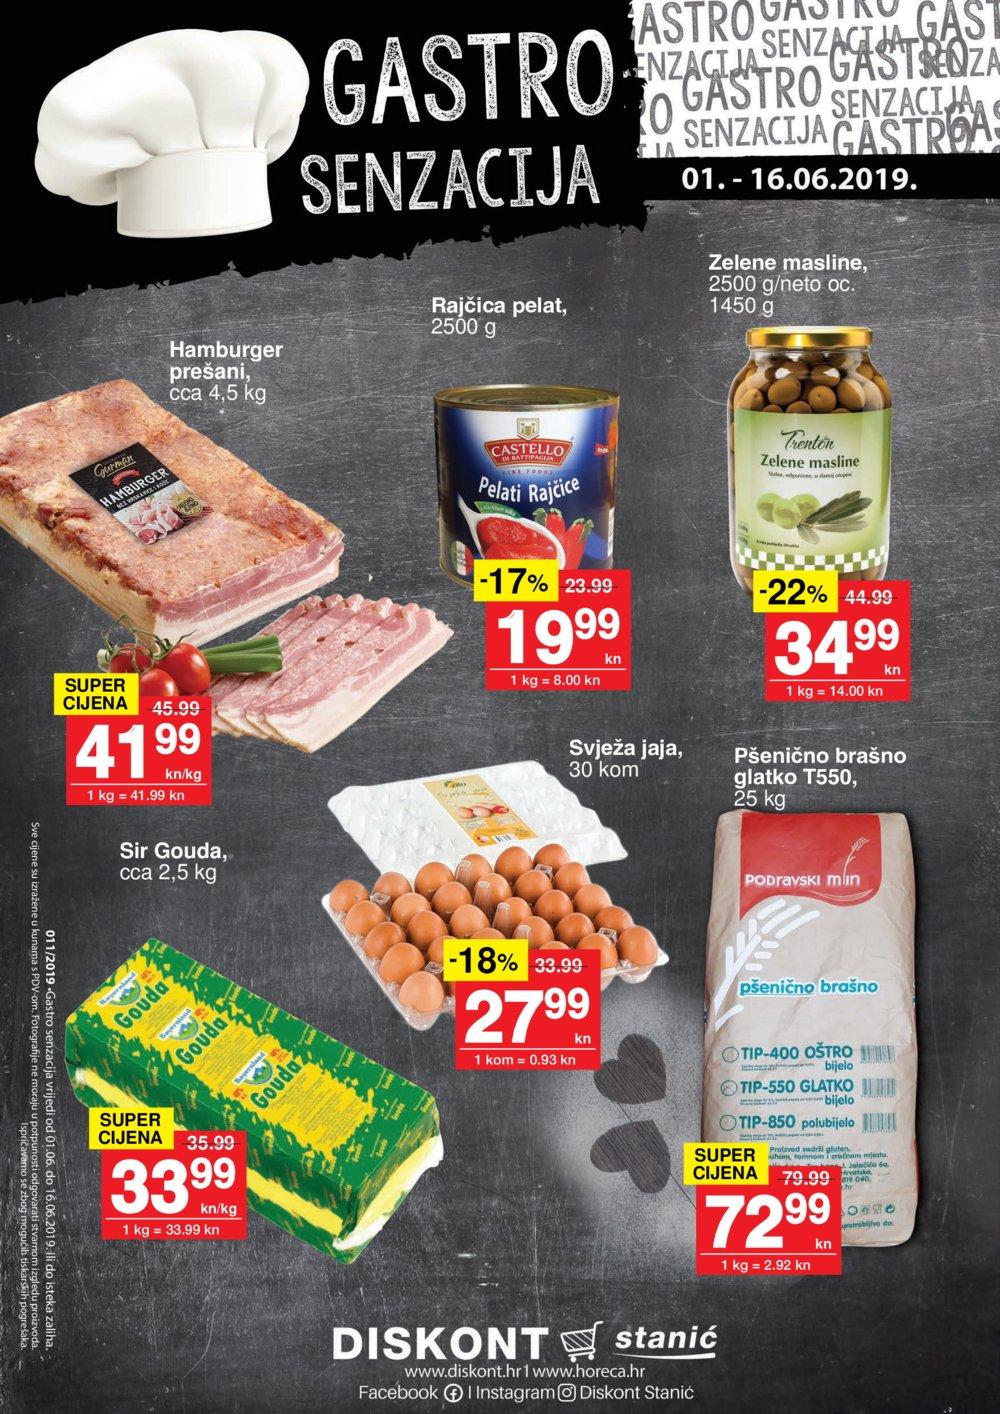 Stanić katalog Gastro 01.06.-16.06.2019.